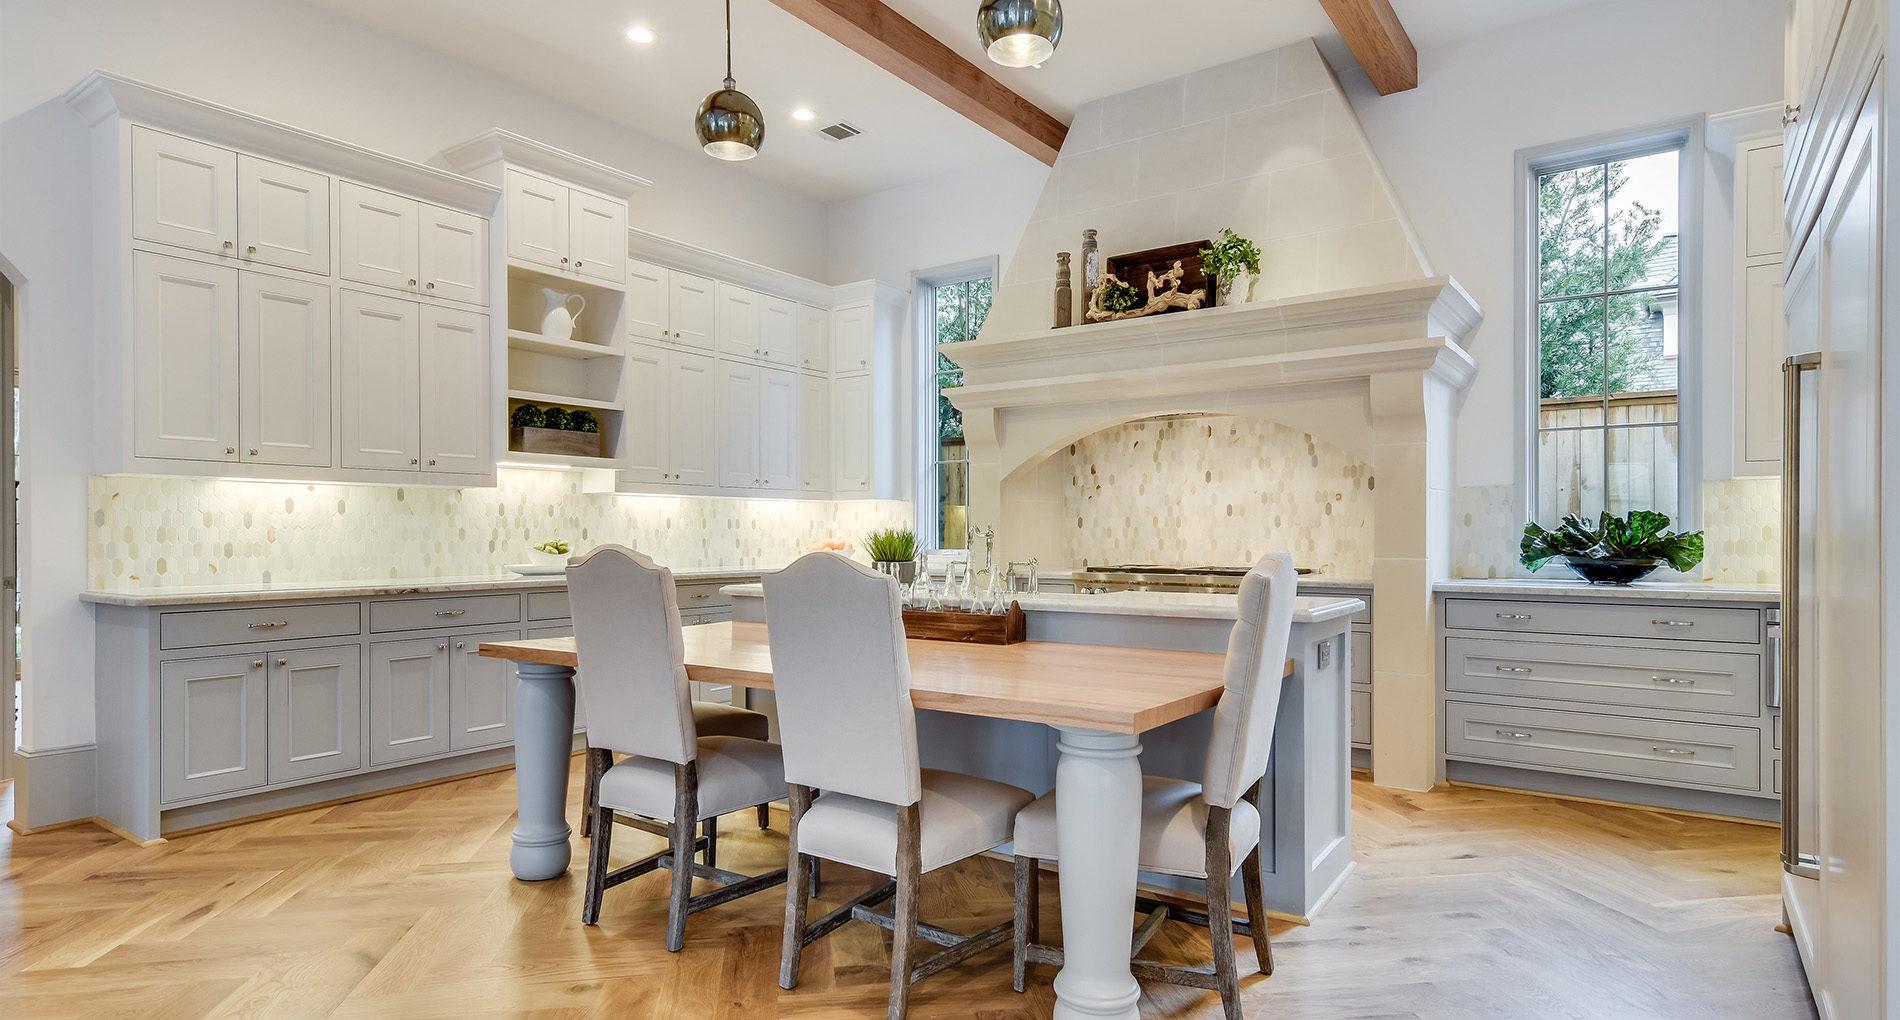 Kitchen Remodel Houston Maplevalley Slider